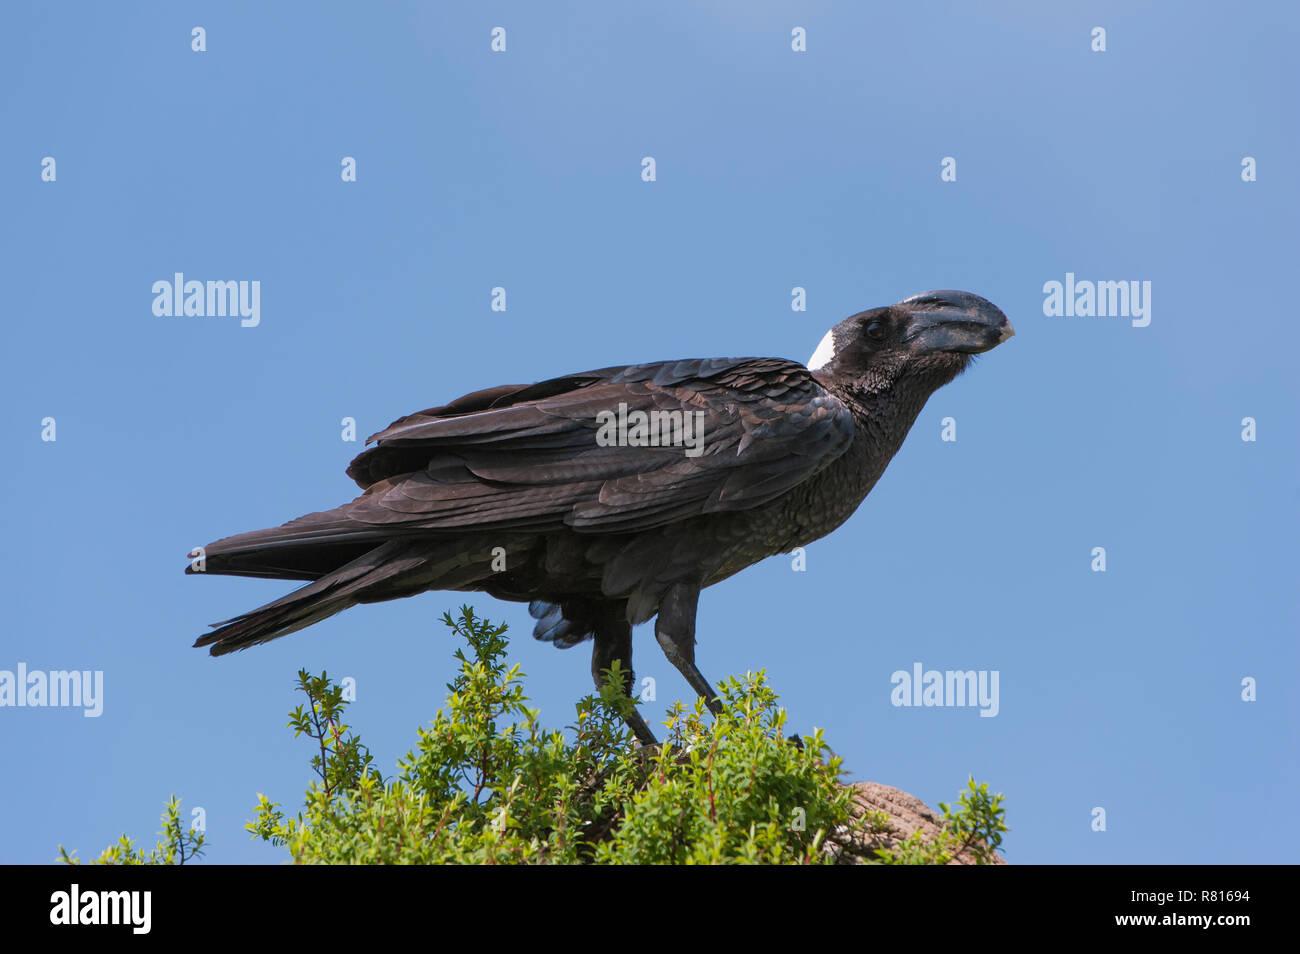 Thick-billed Raven (Corvus crassirostris), Simien Mountains National Park, Amhara Region, Ethiopia - Stock Image